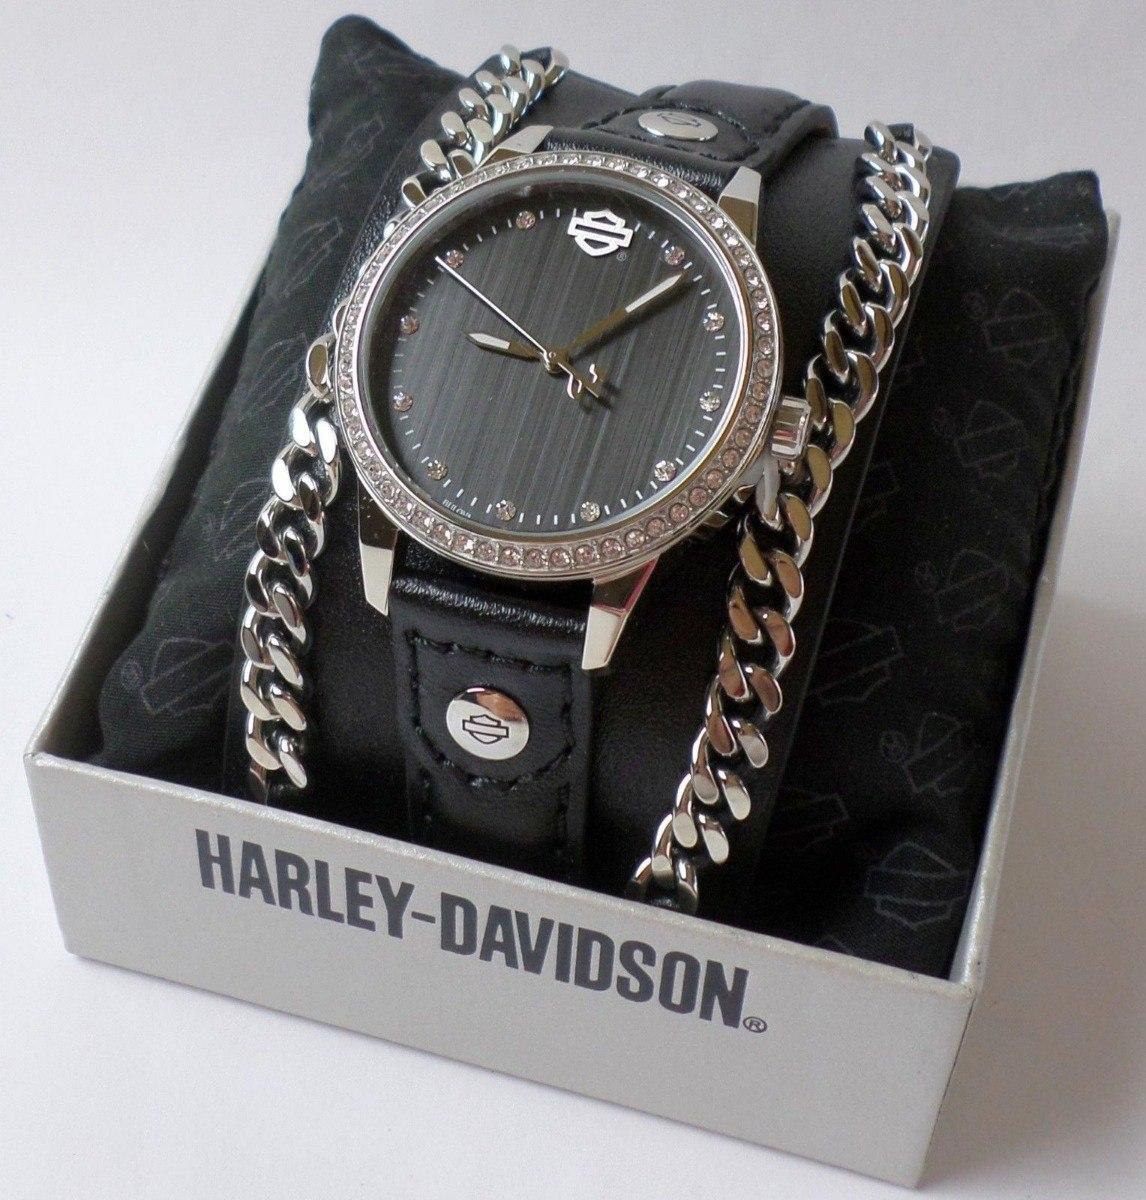 6e145b72447 harley davidson relógio feminino crystal bulova original. Carregando zoom.